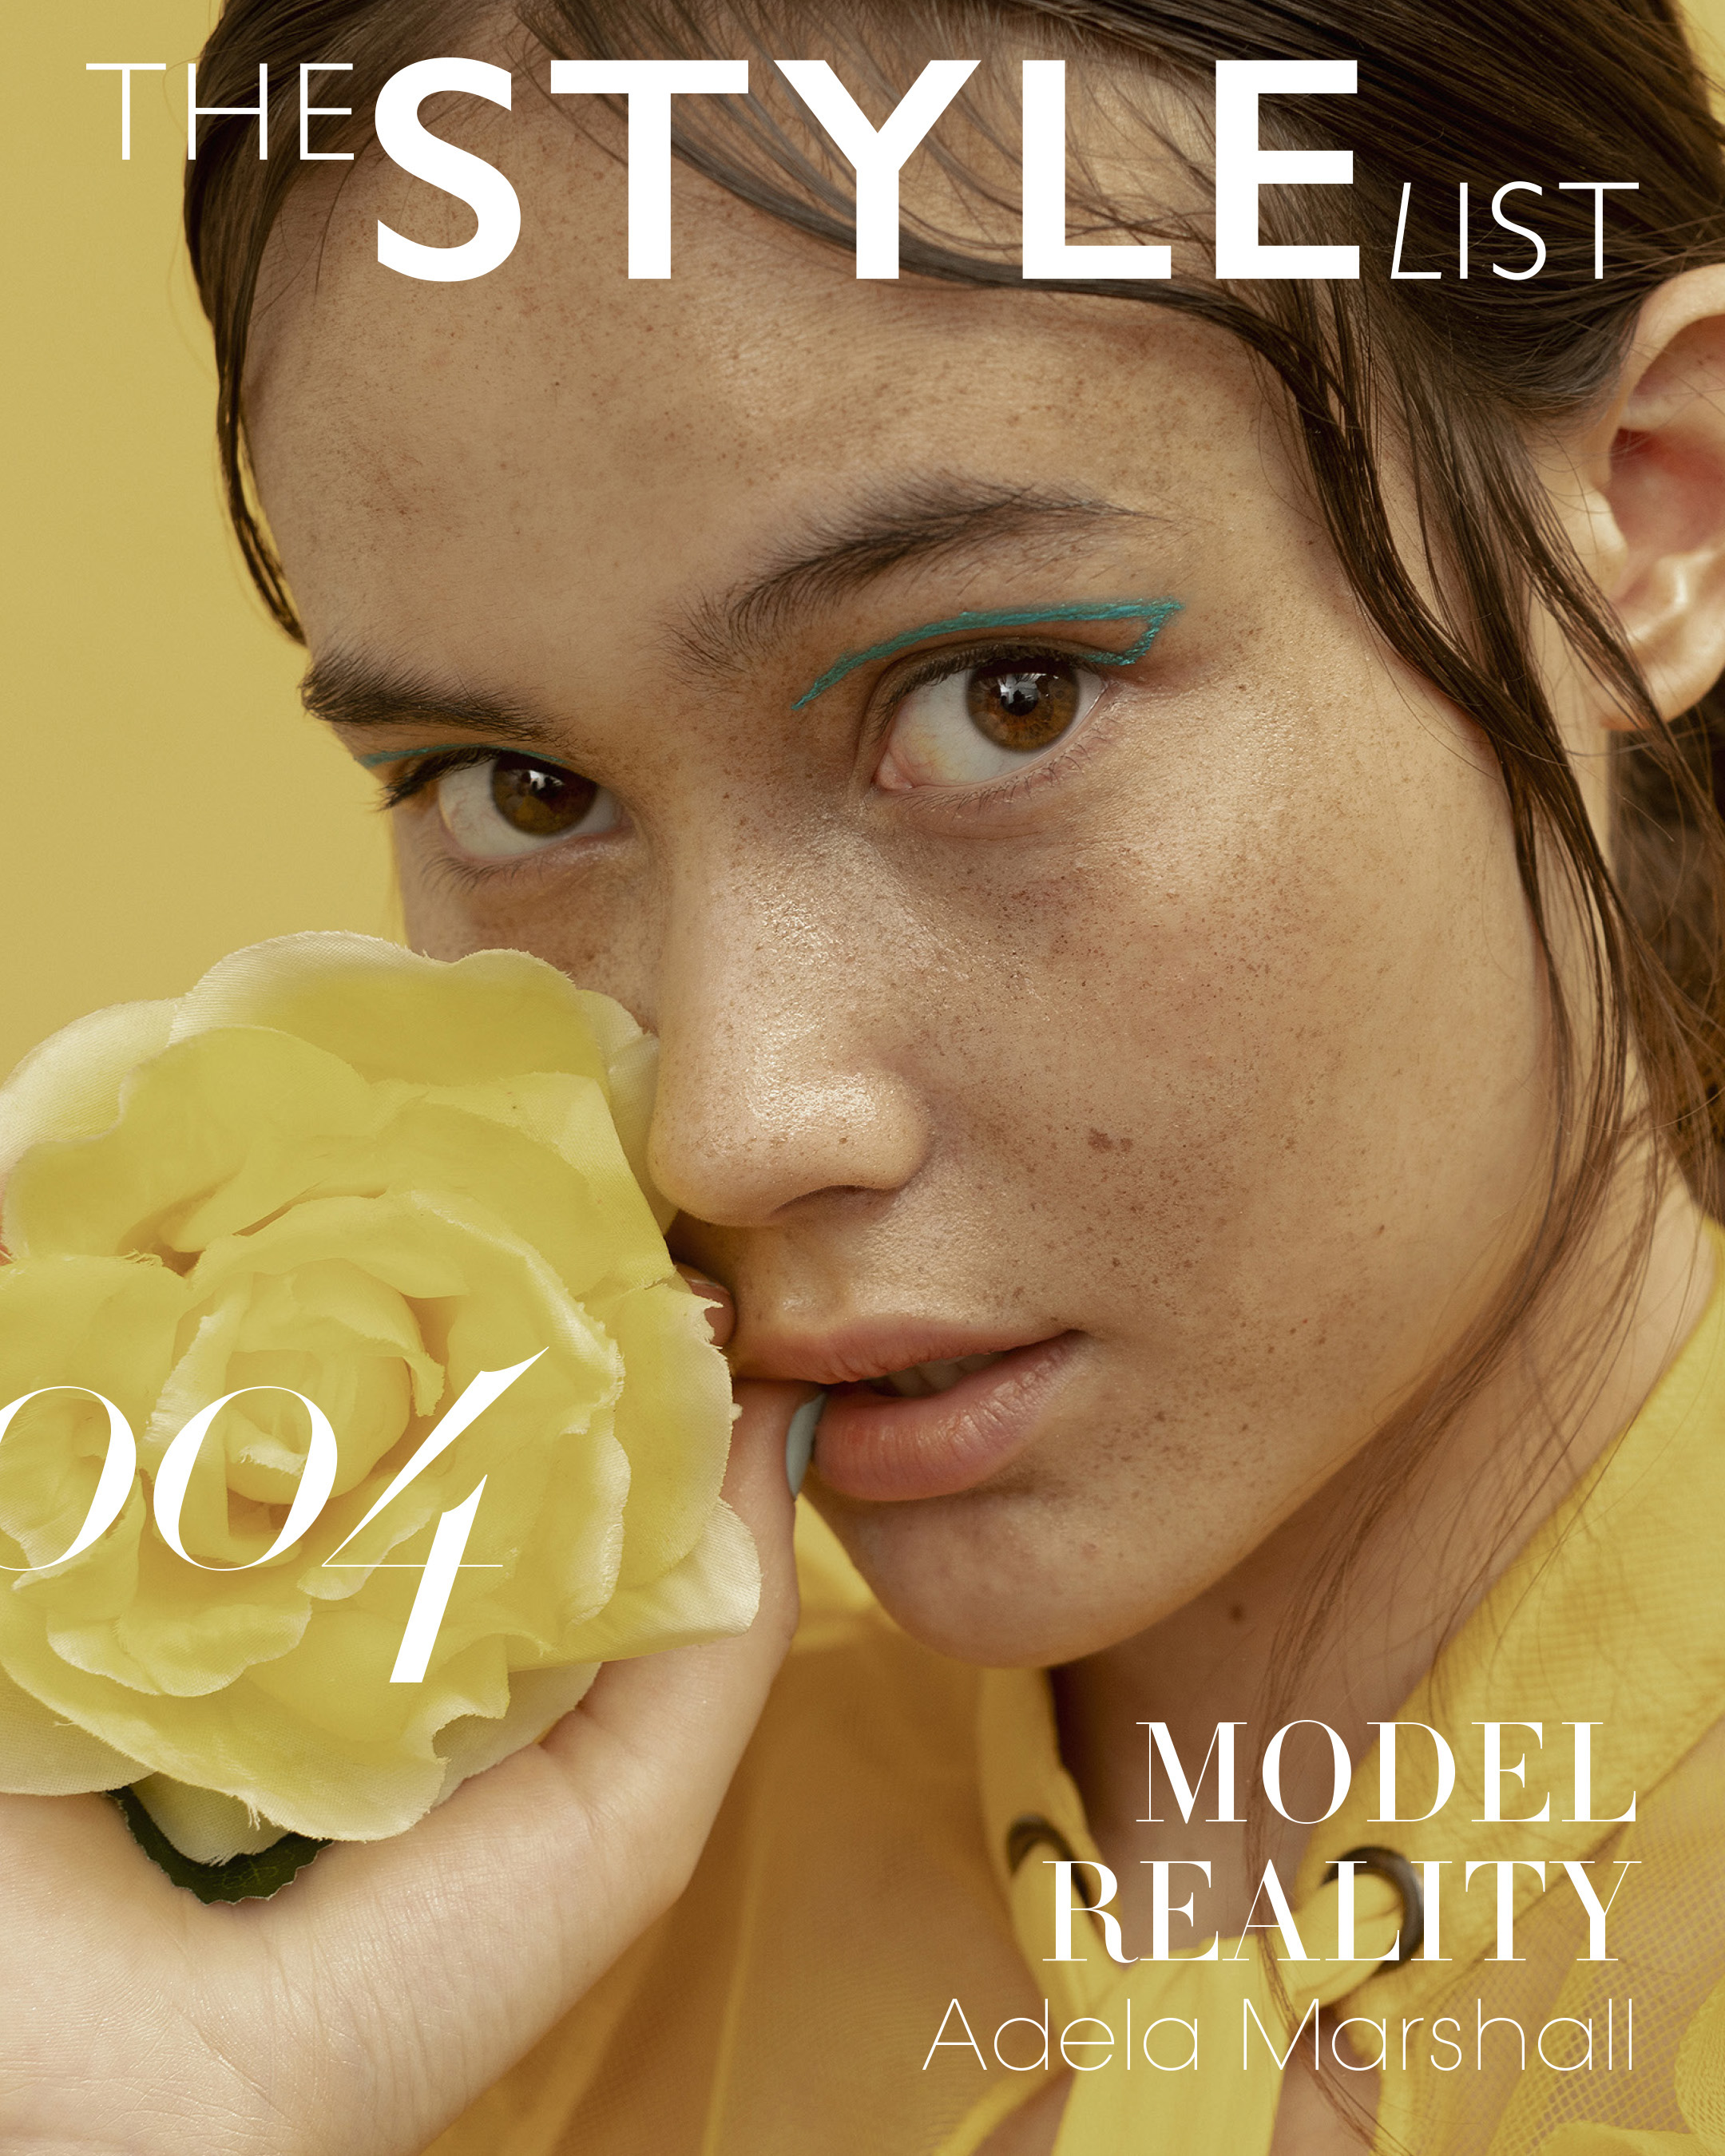 TheStyleListPh Cover-Adela4-2.jpg